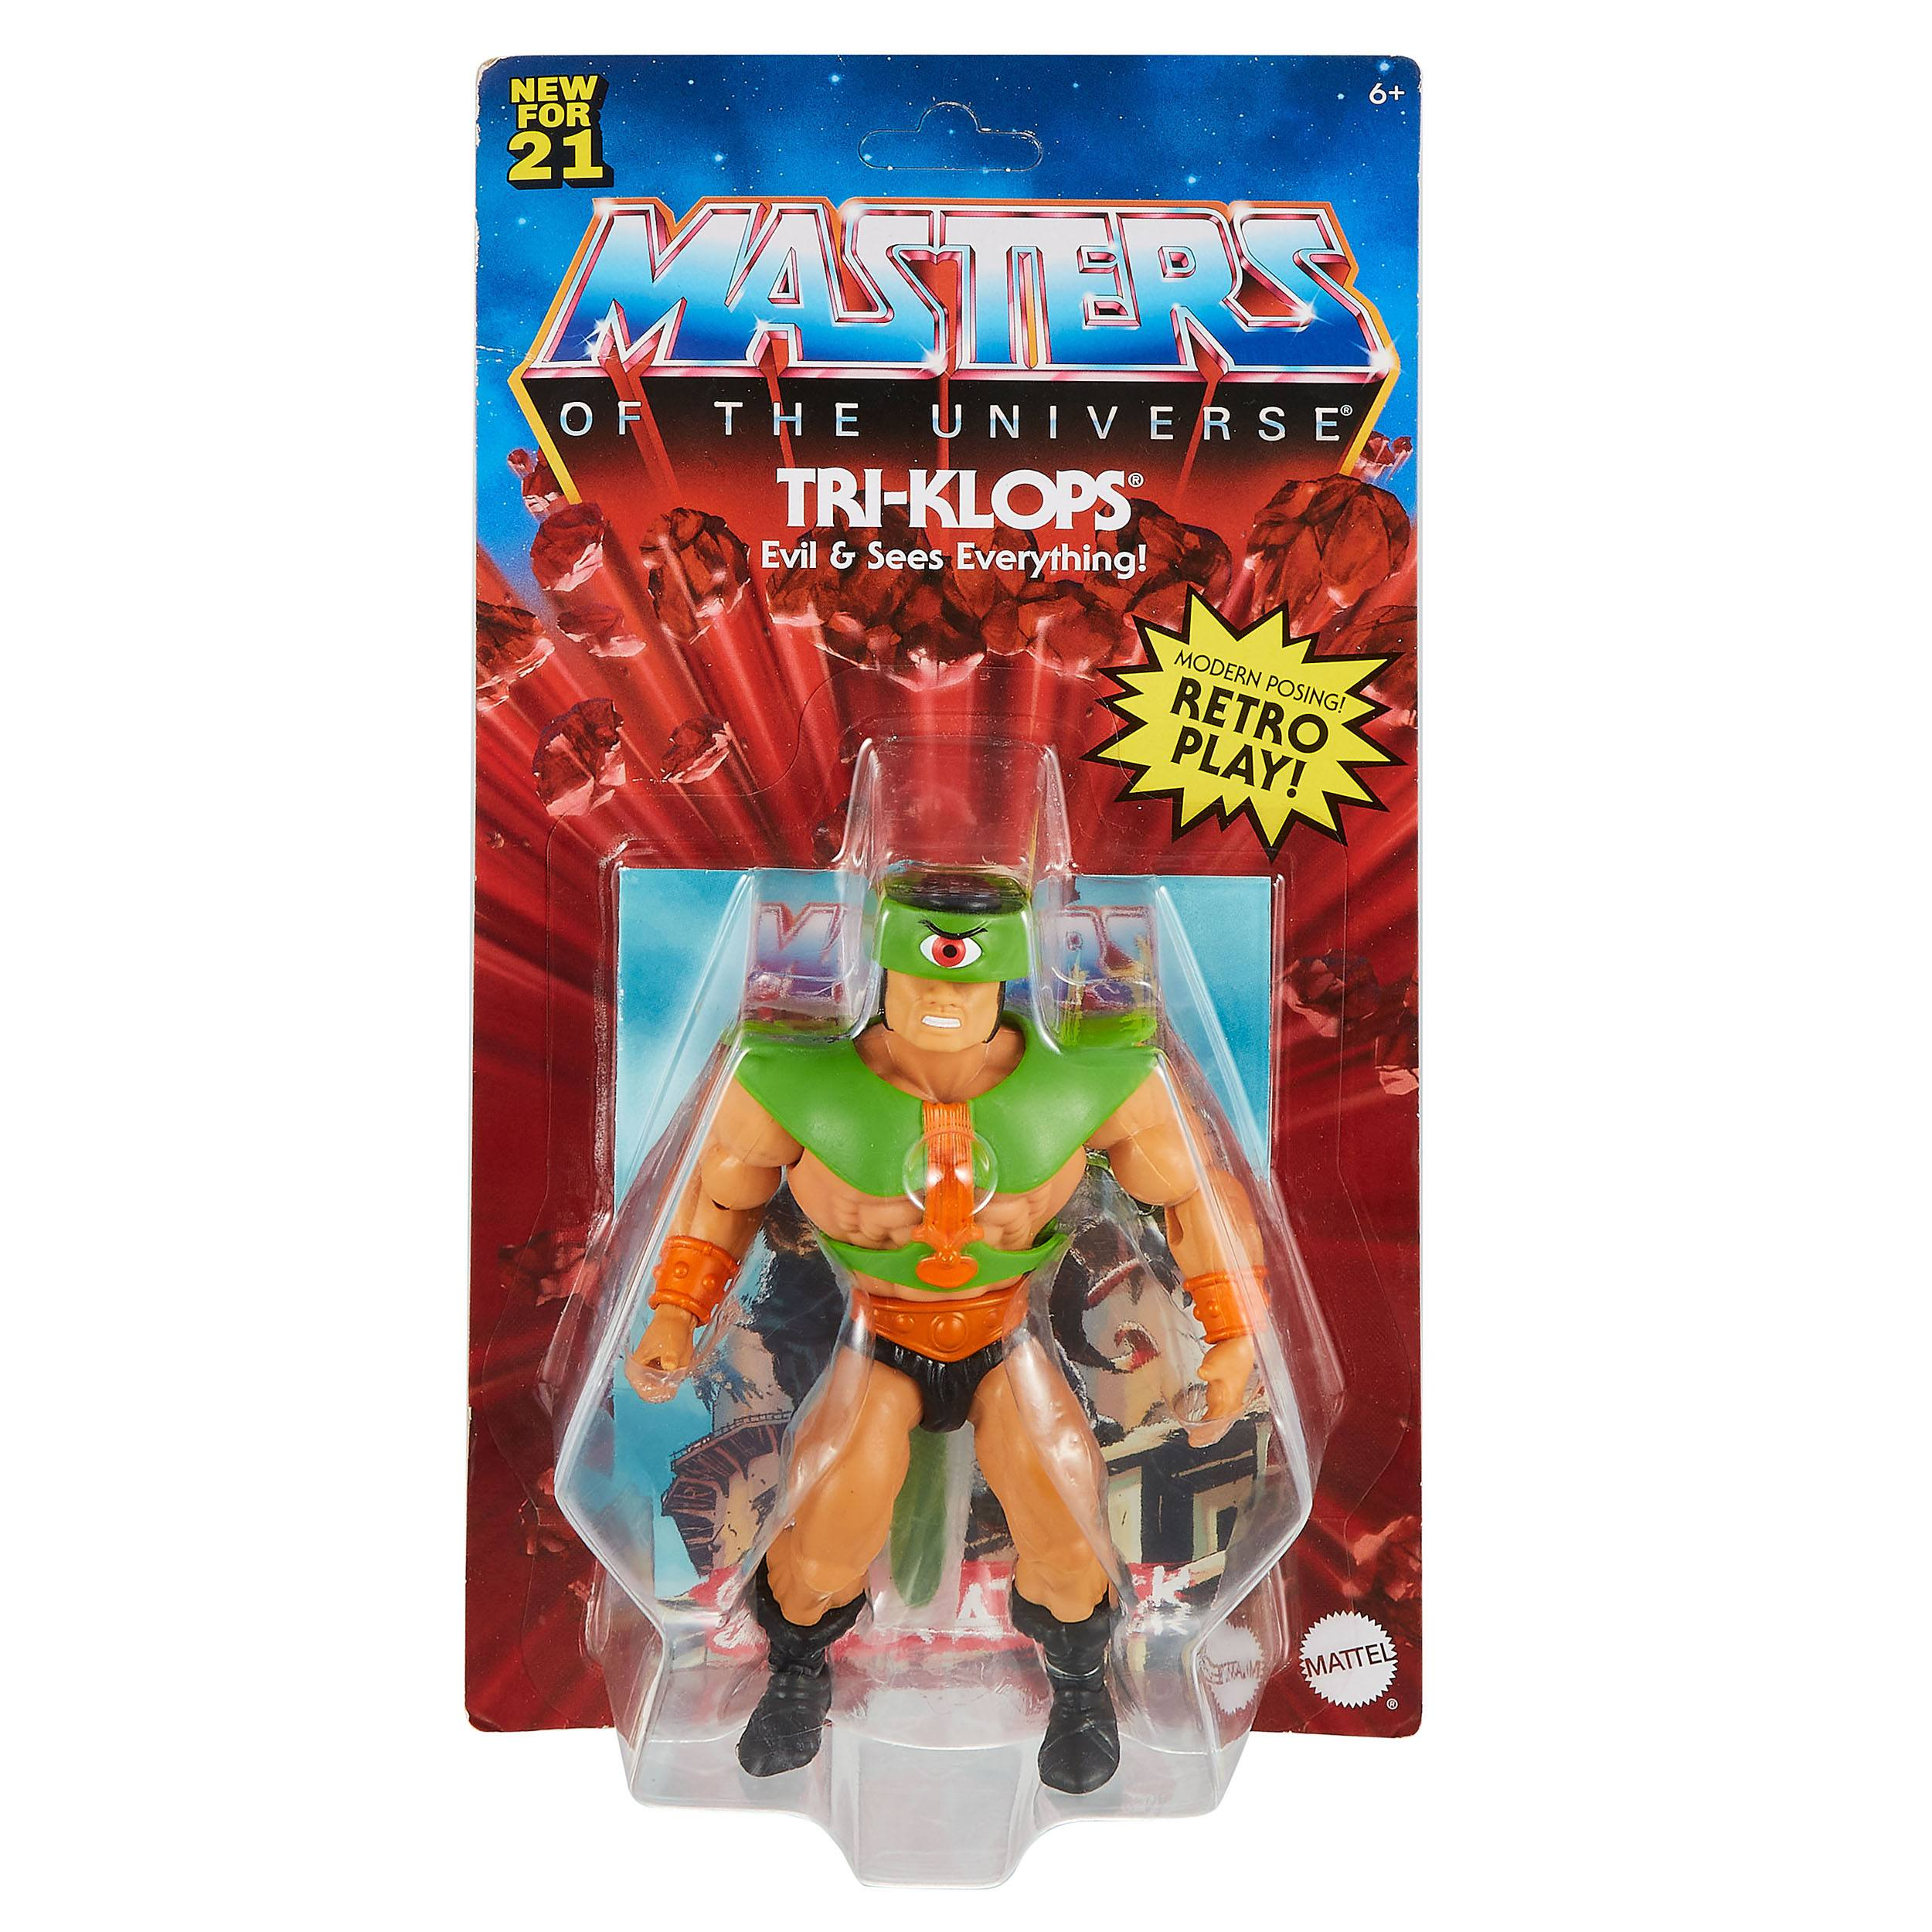 Masters of the Universe Origins Actionfigur 2021 Triclops 14 cm (EU Karte) MATTGRX02 887961913392